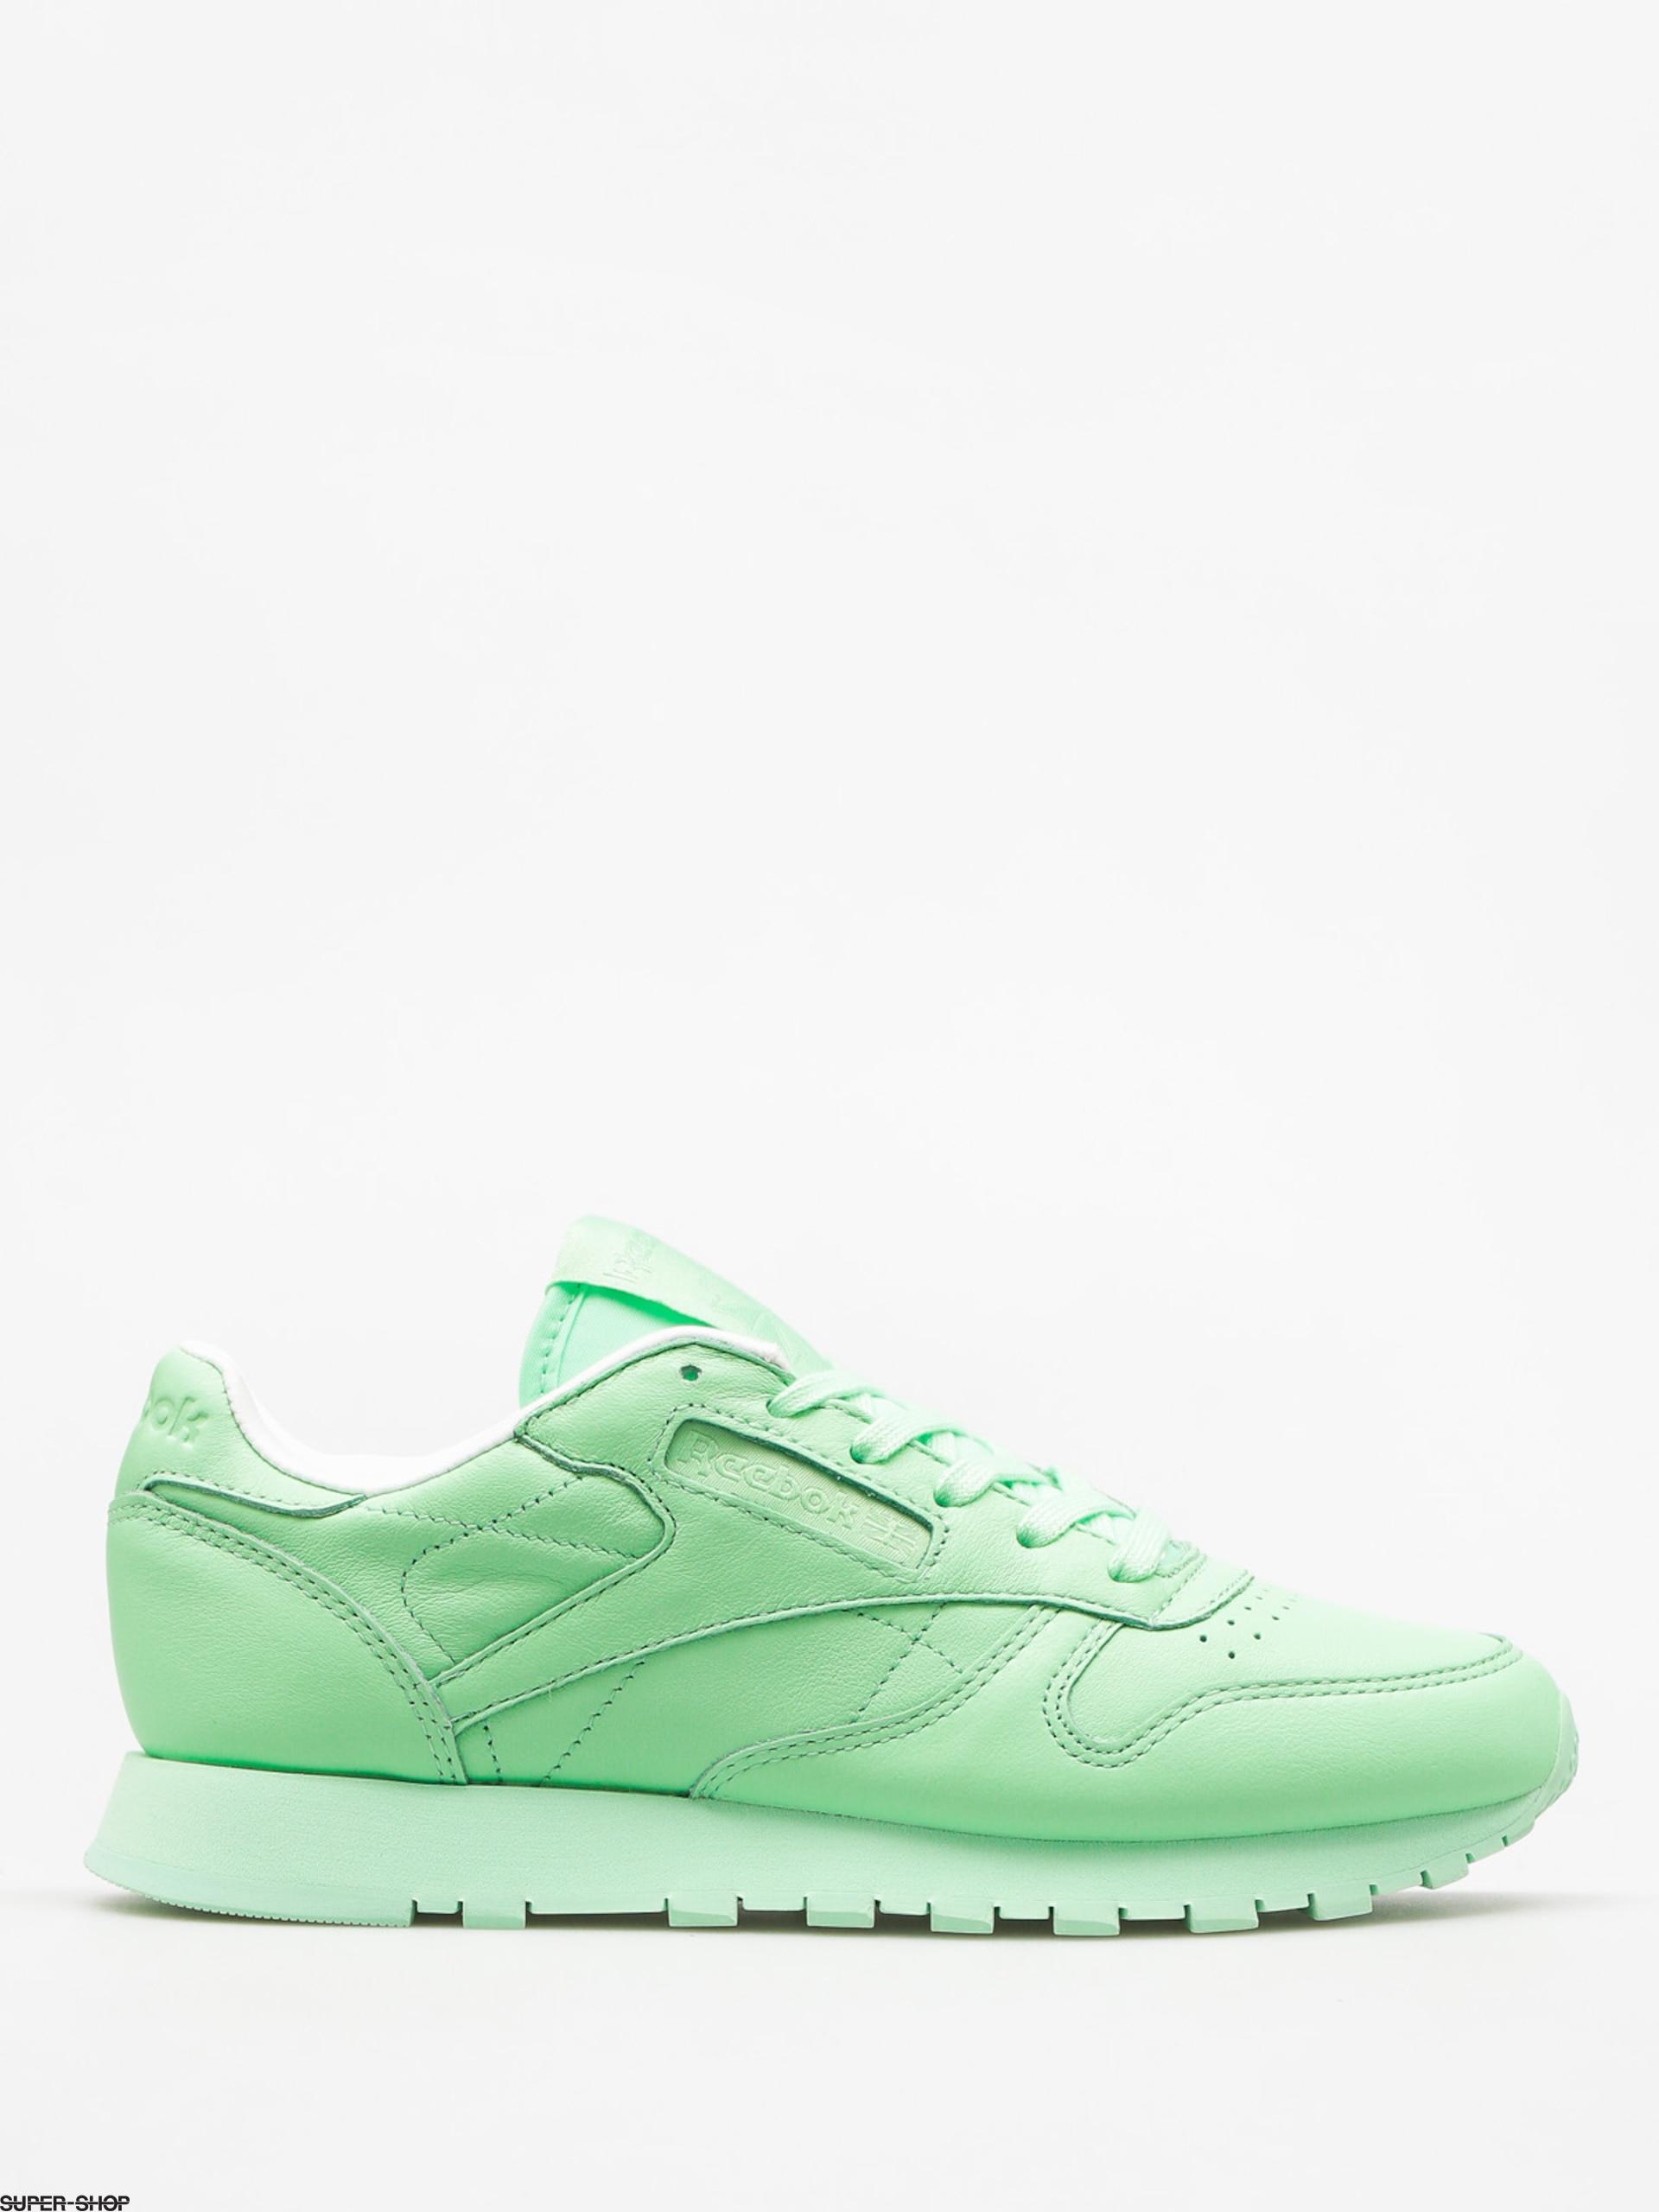 za pół zniżka szczegóły Reebok Shoes Cl Lthr Pastels Wmn (mint green/white)